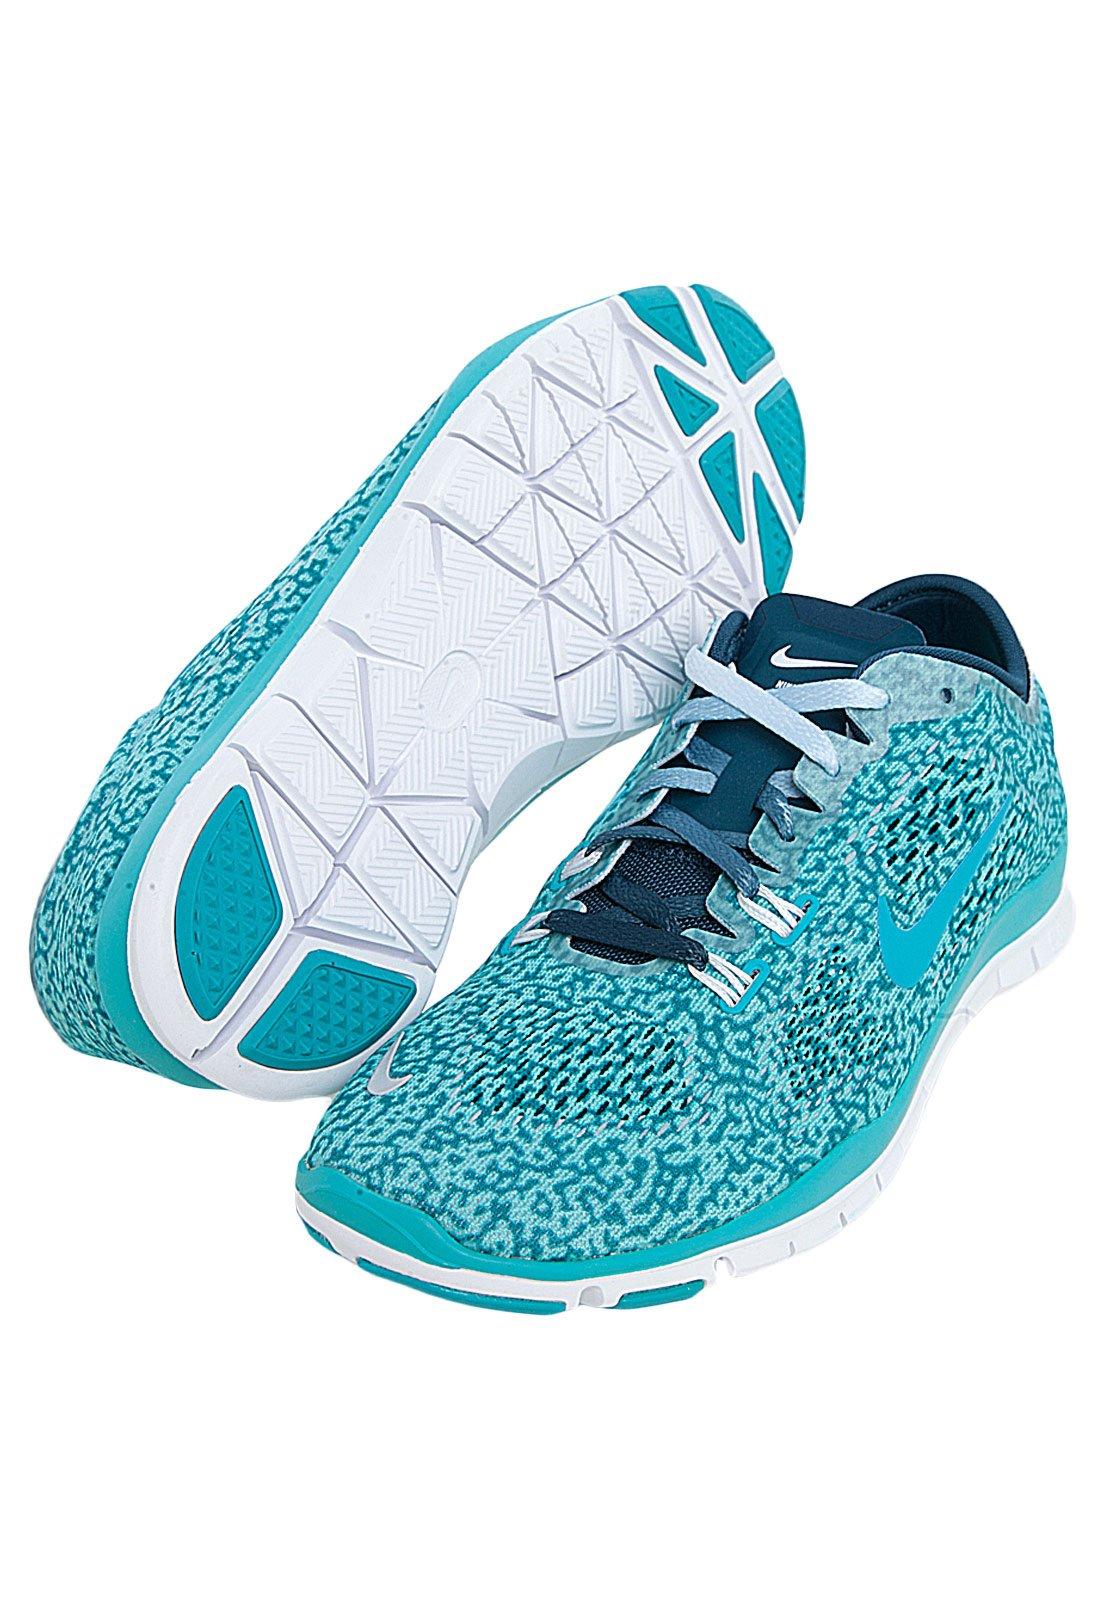 Ahorro Indígena peor  Tênis Nike WMNS Free 5.0 TR Fit 4 PRT Azul - Compre Agora | Dafiti Brasil